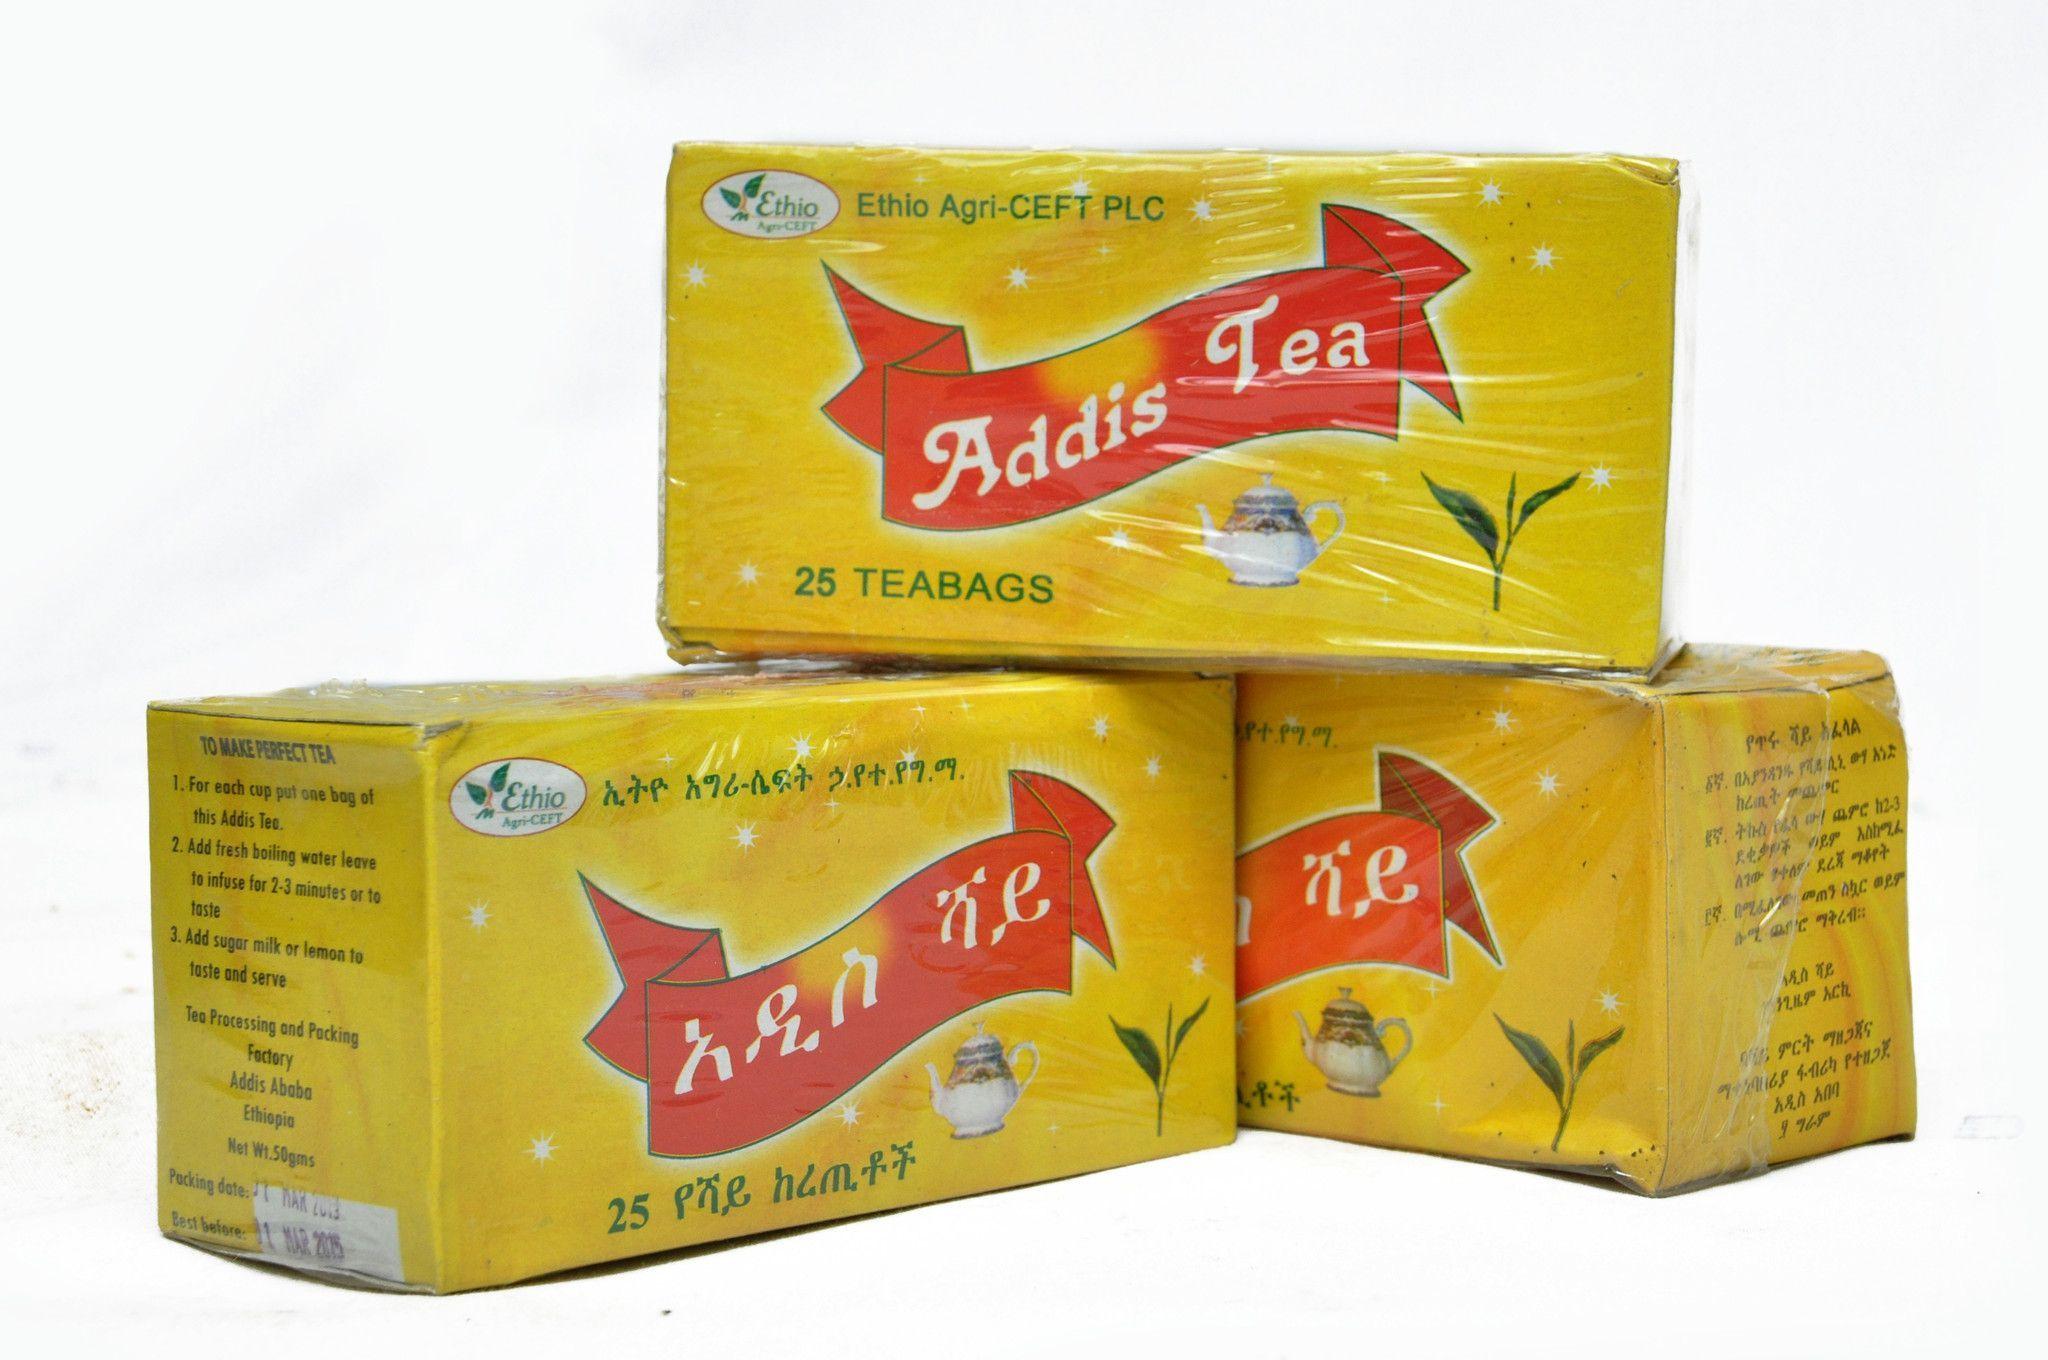 Addis Shay Ethiopian Black Tea Black Tea Tea Ethiopian